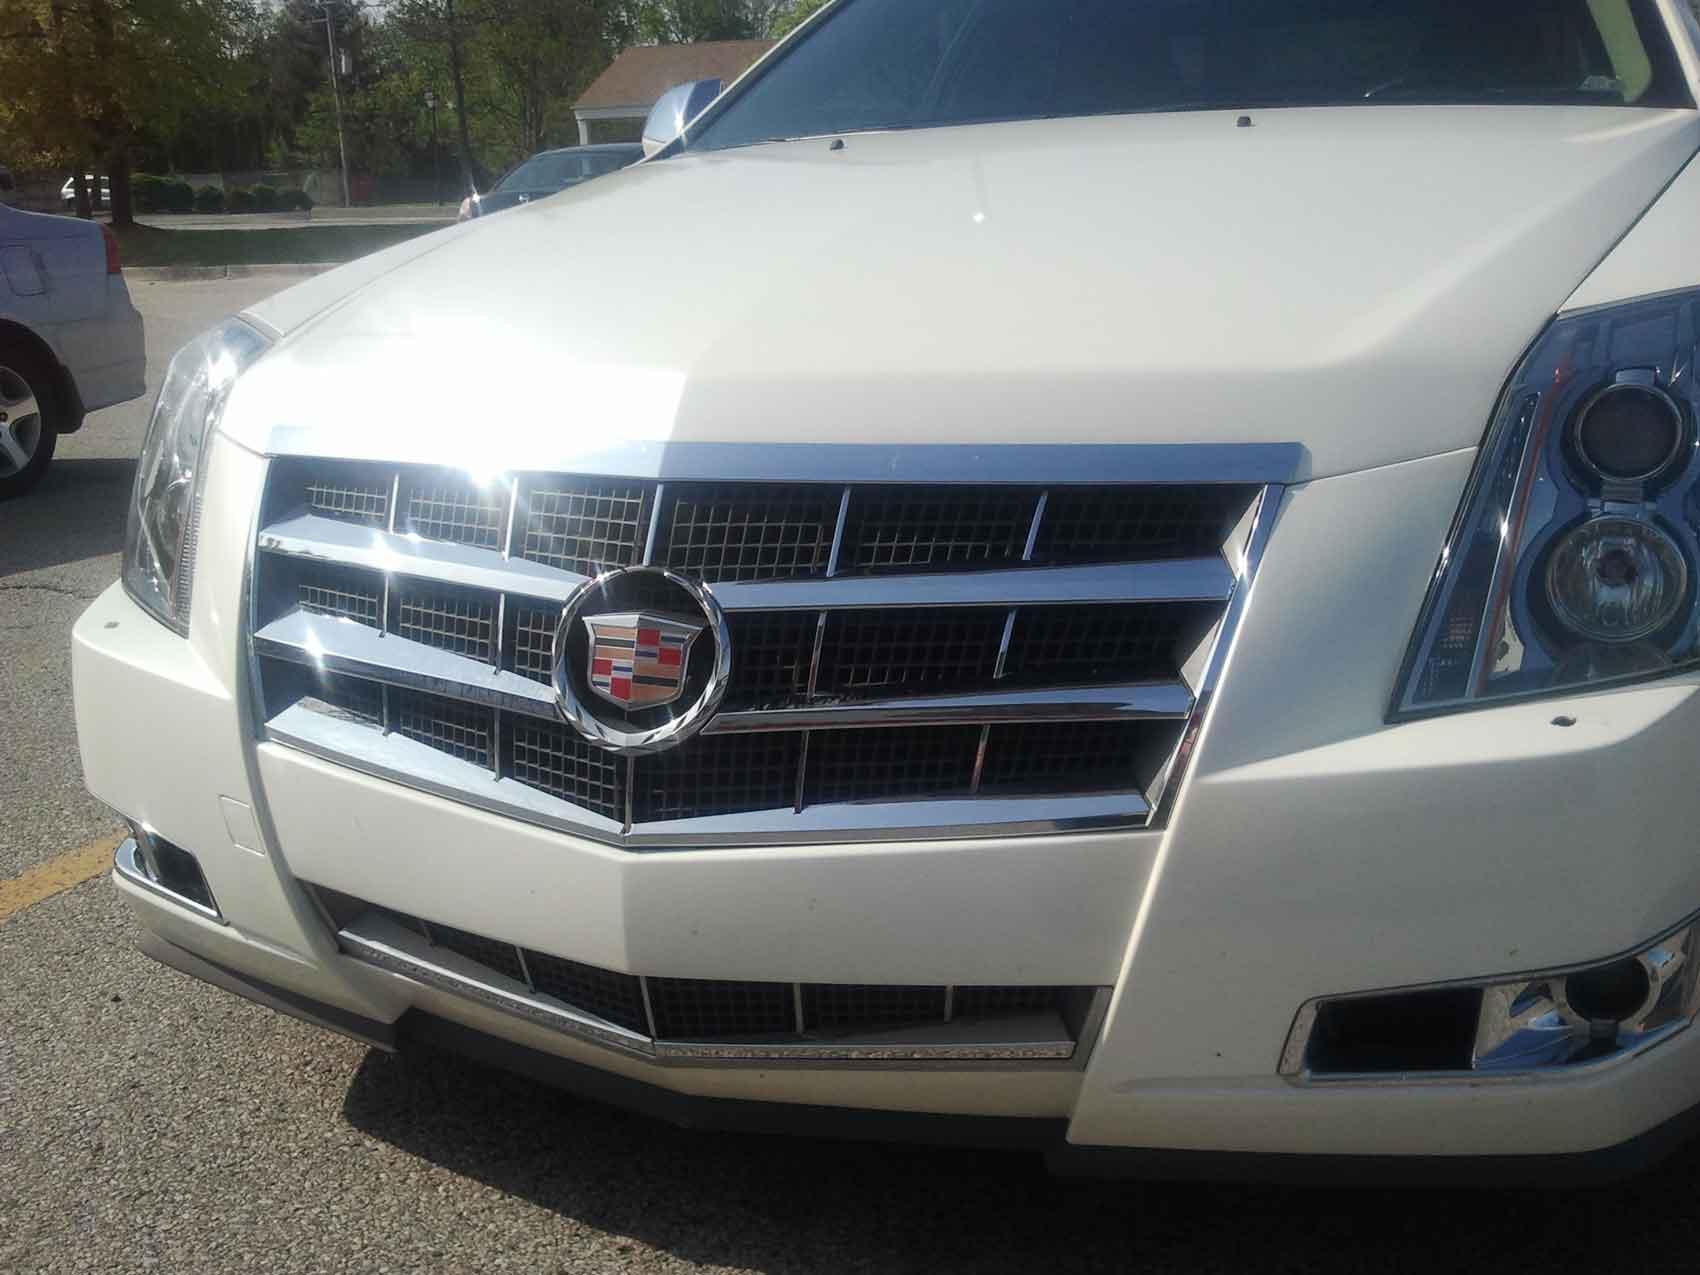 Cadillac Chrome Grille